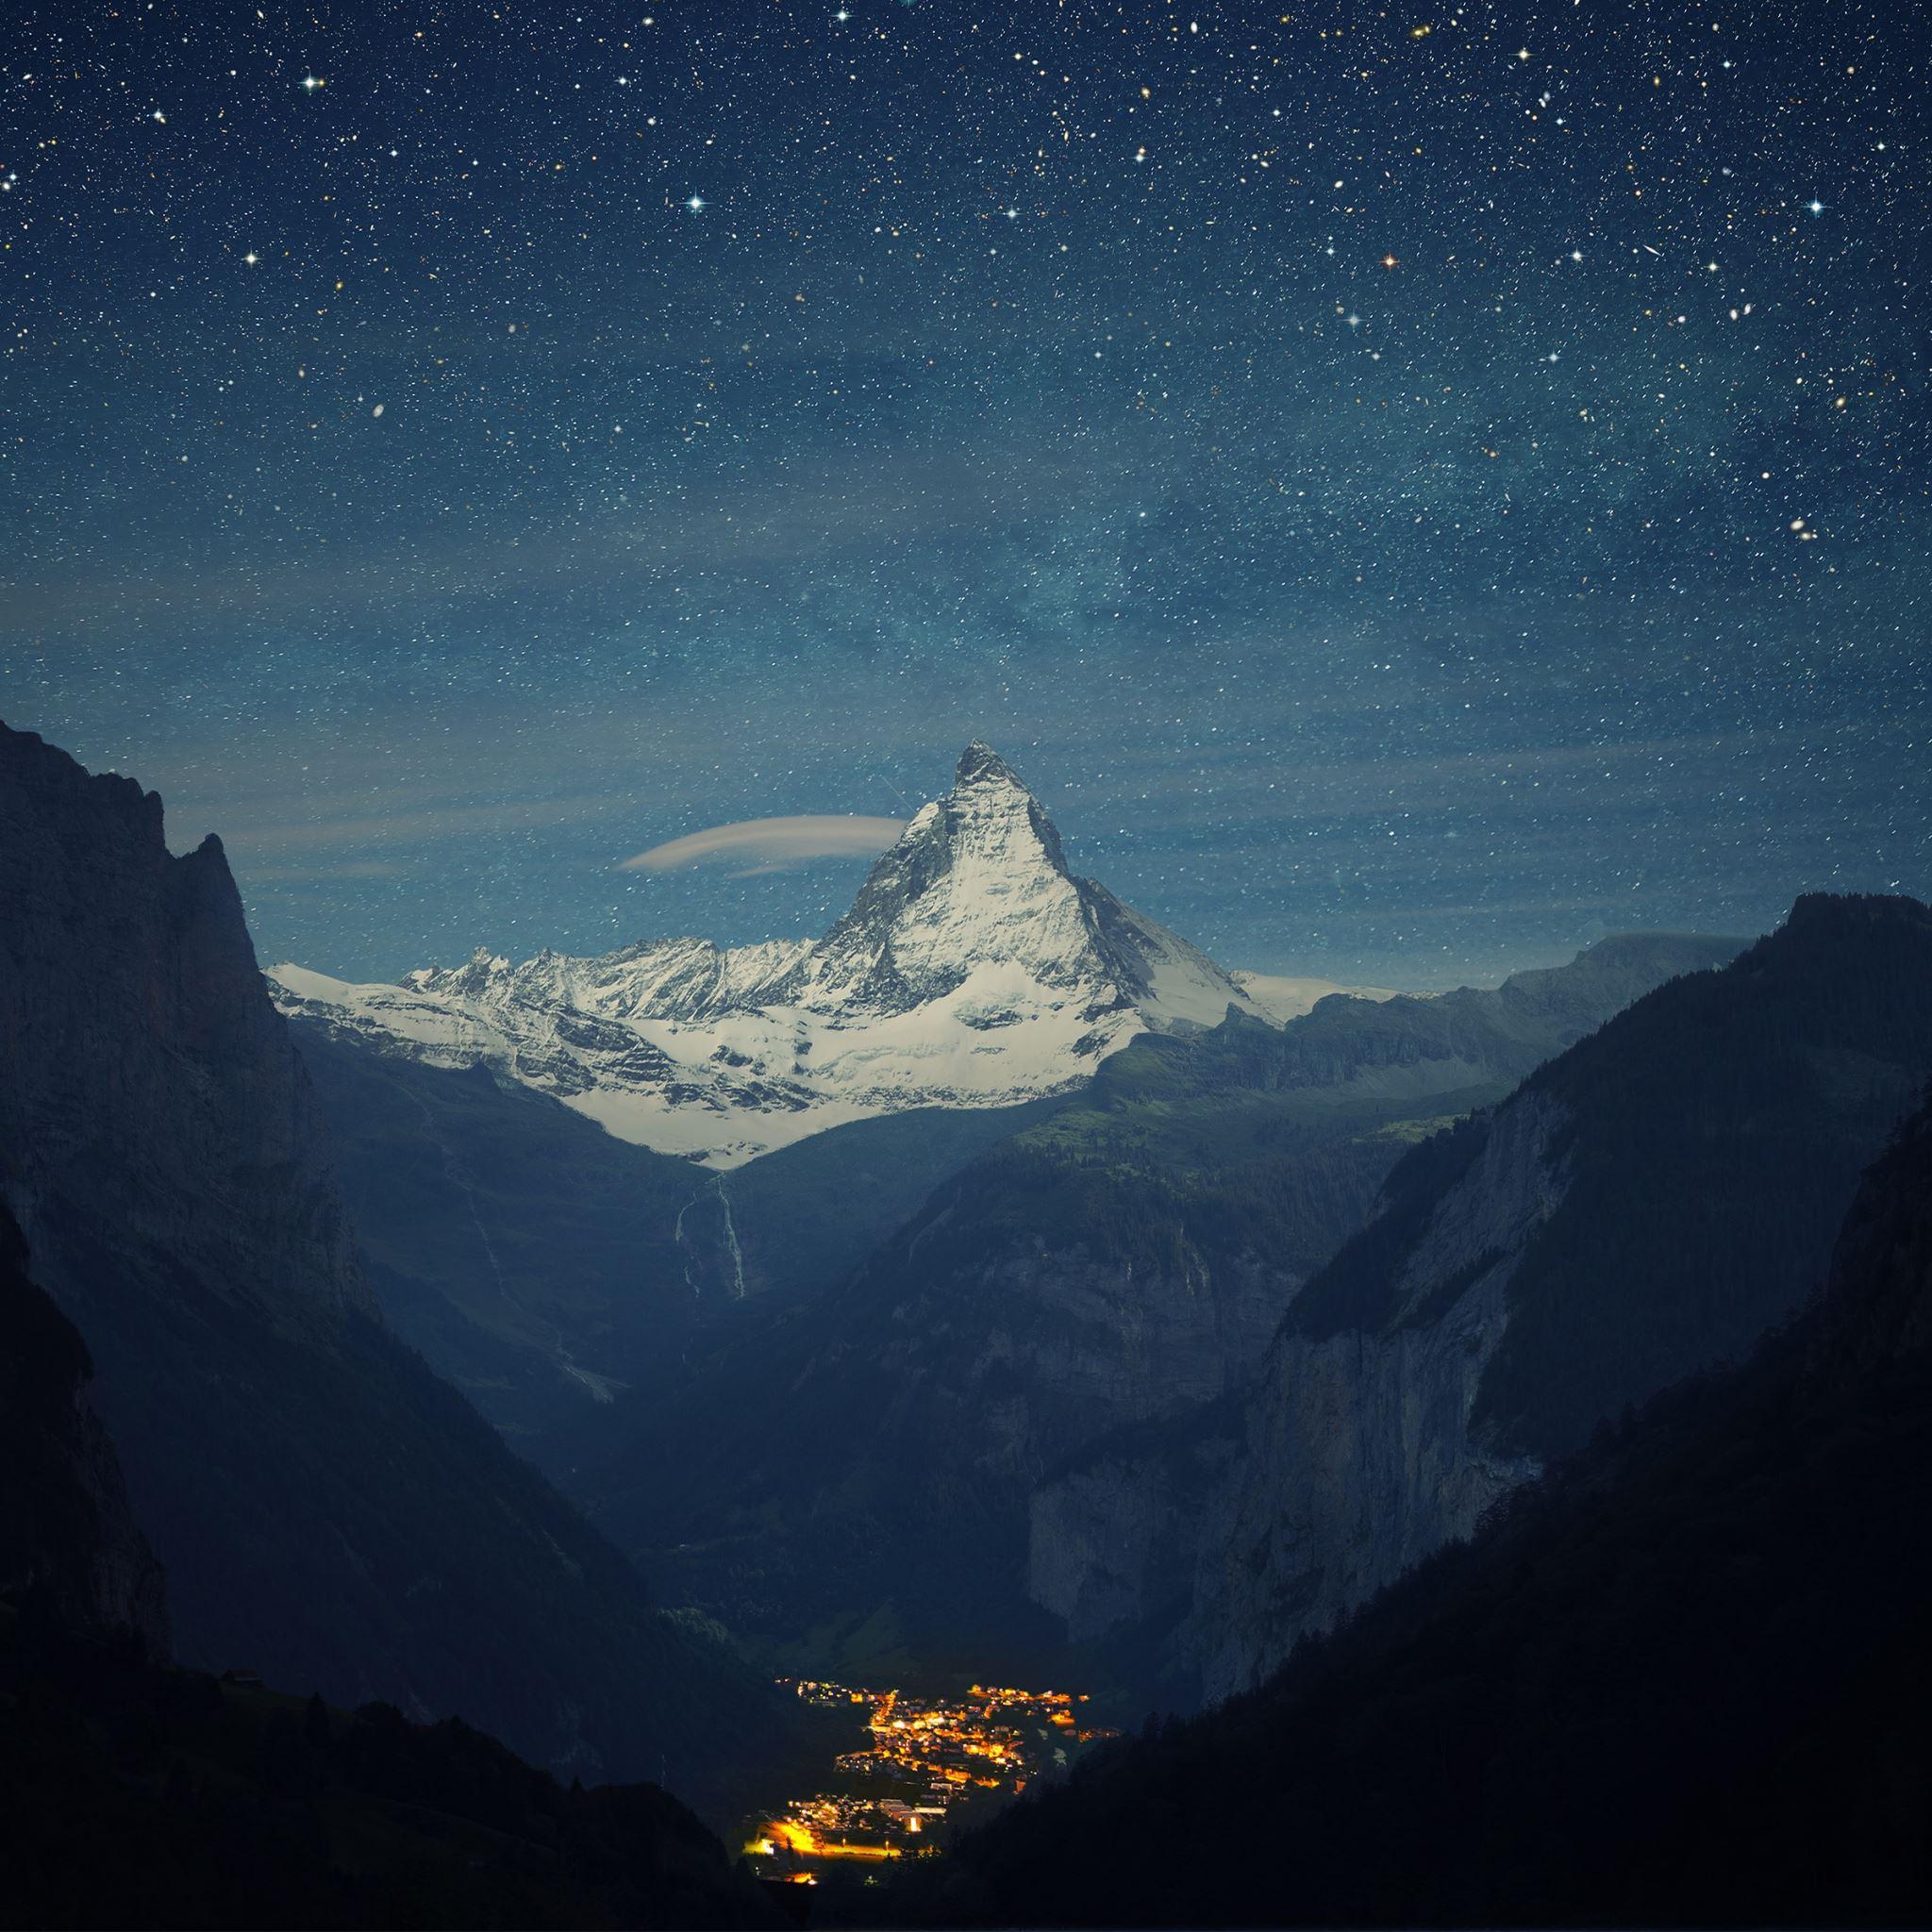 Top Wallpaper Mountain Ipad Mini - Switzerland-Alps-Mountains-Night-Beautiful-Landscape-ipad-air-wallpaper-ilikewallpaper_com  Collection_995114.jpg